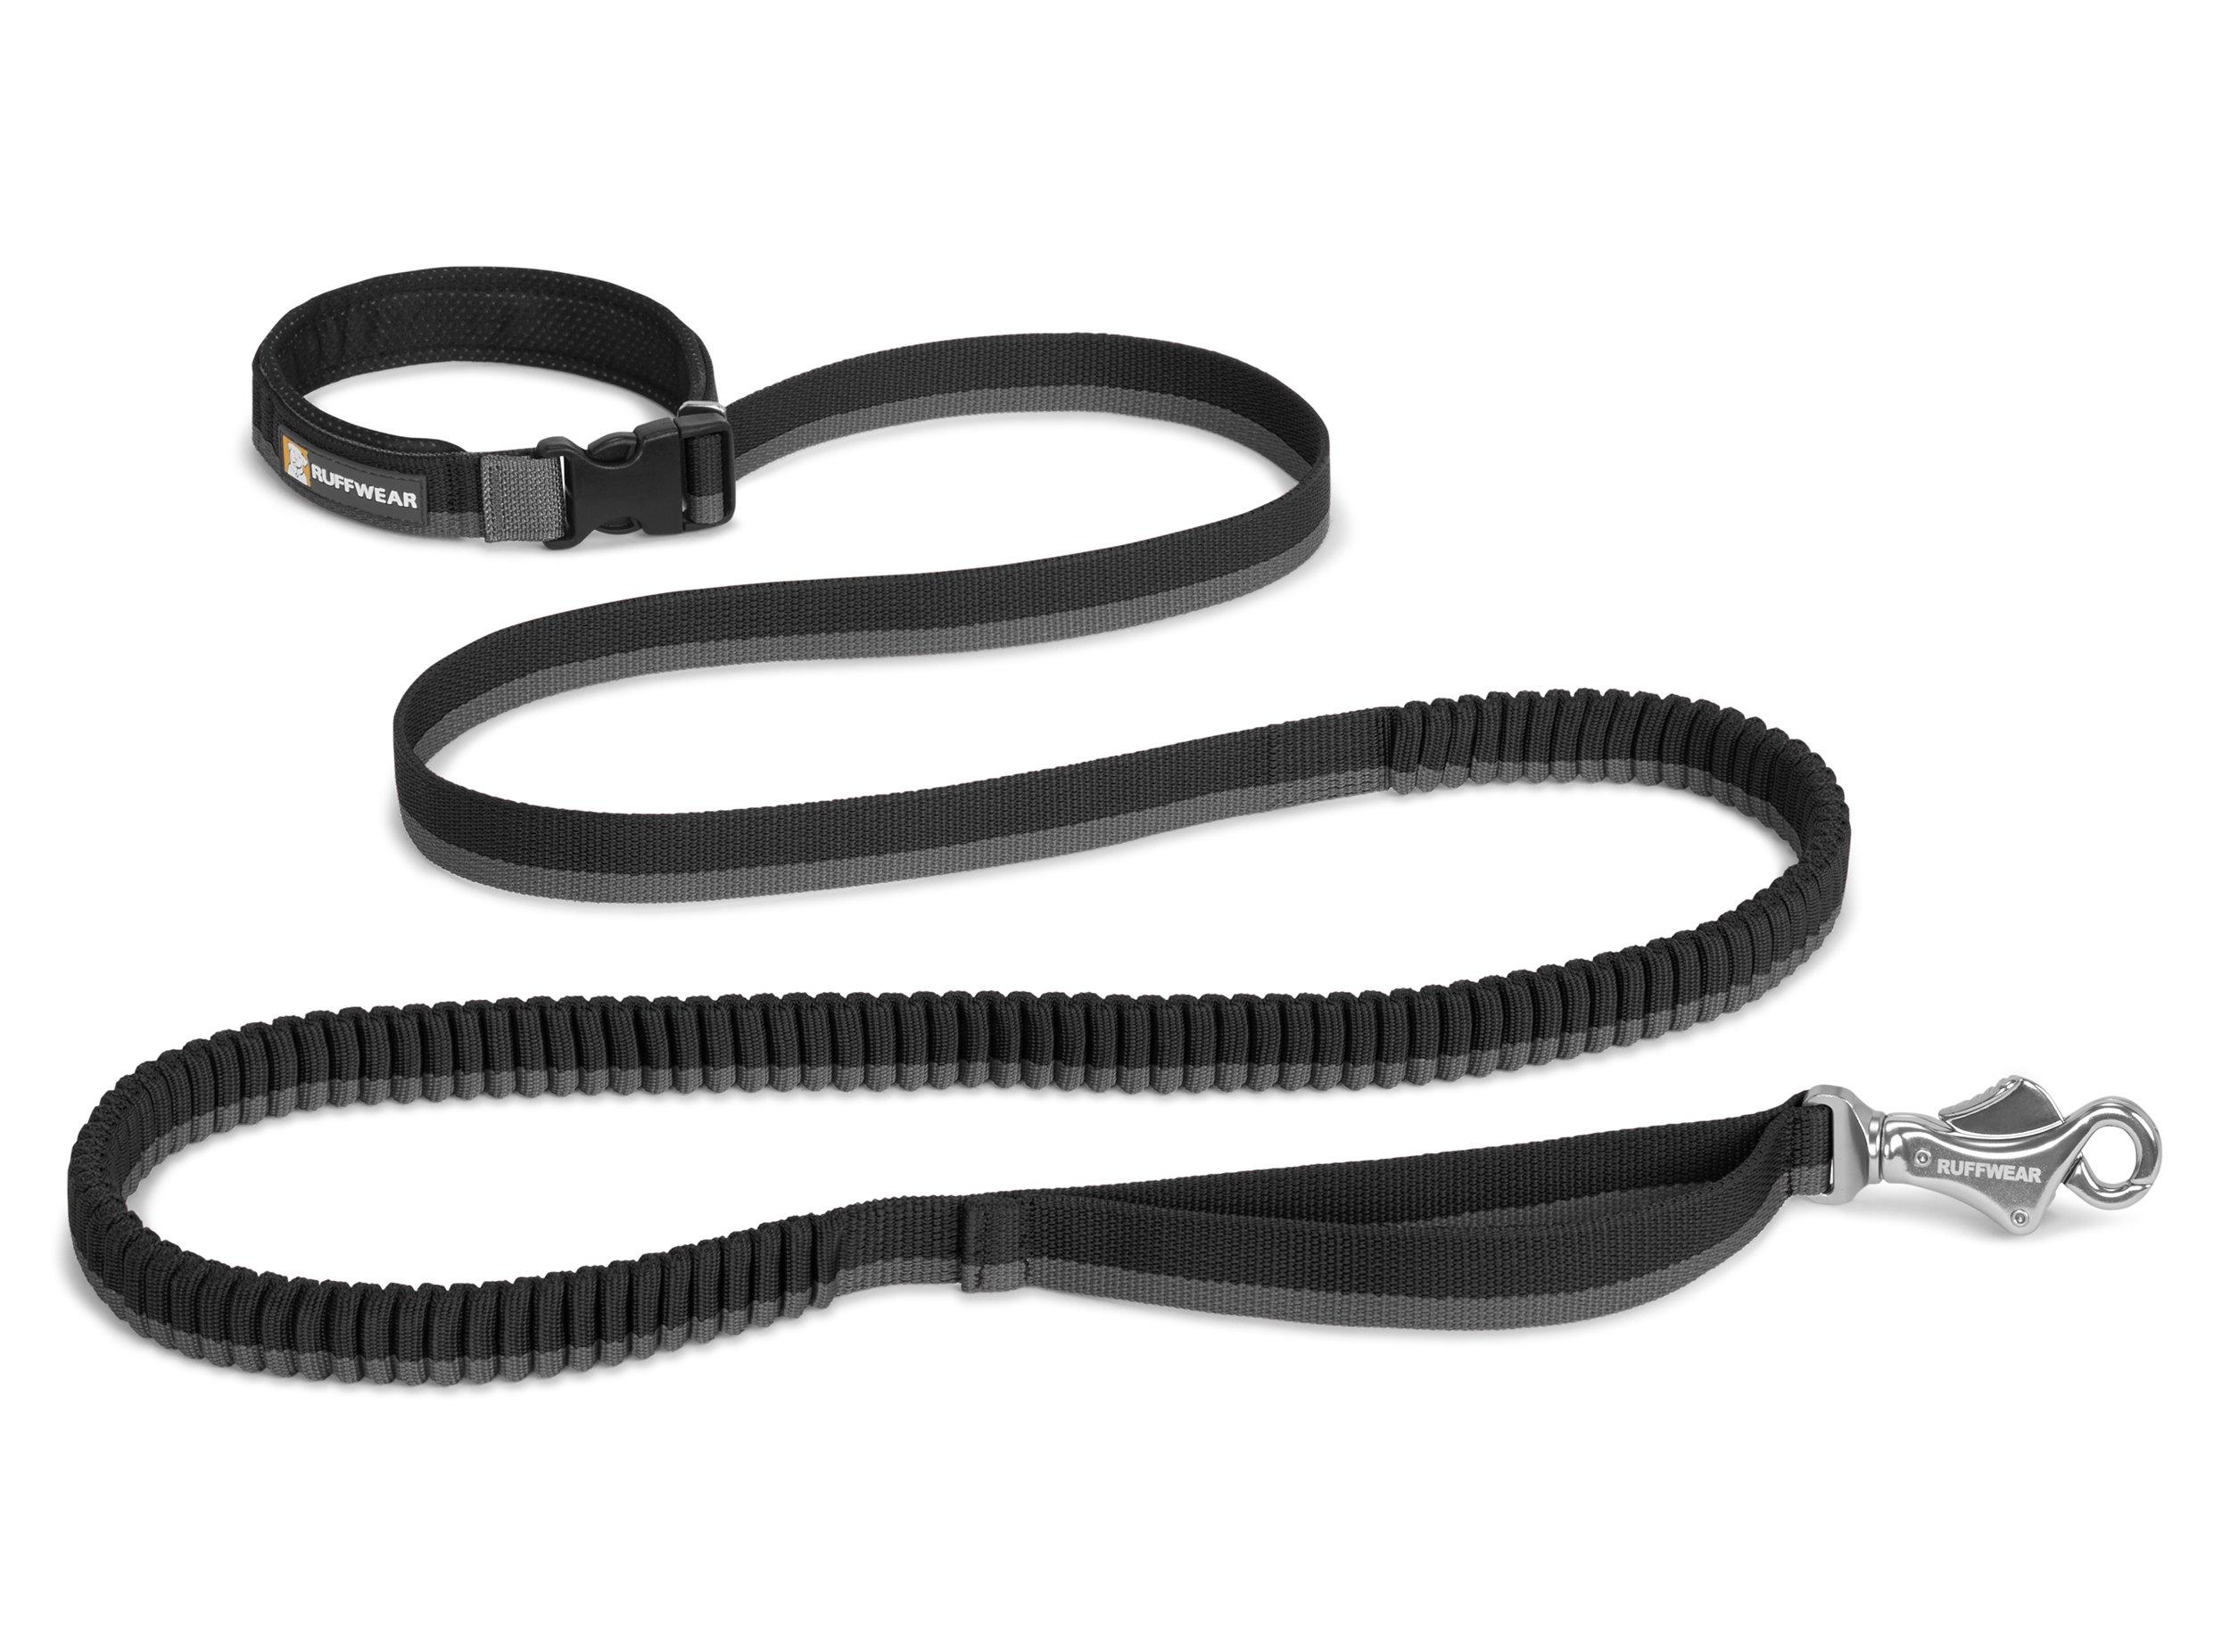 RUFFWEAR - Roamer Hand-Held or Waist-Worn Extending Dog Leash, Obsidian Black (2017), 7.3-11 ft